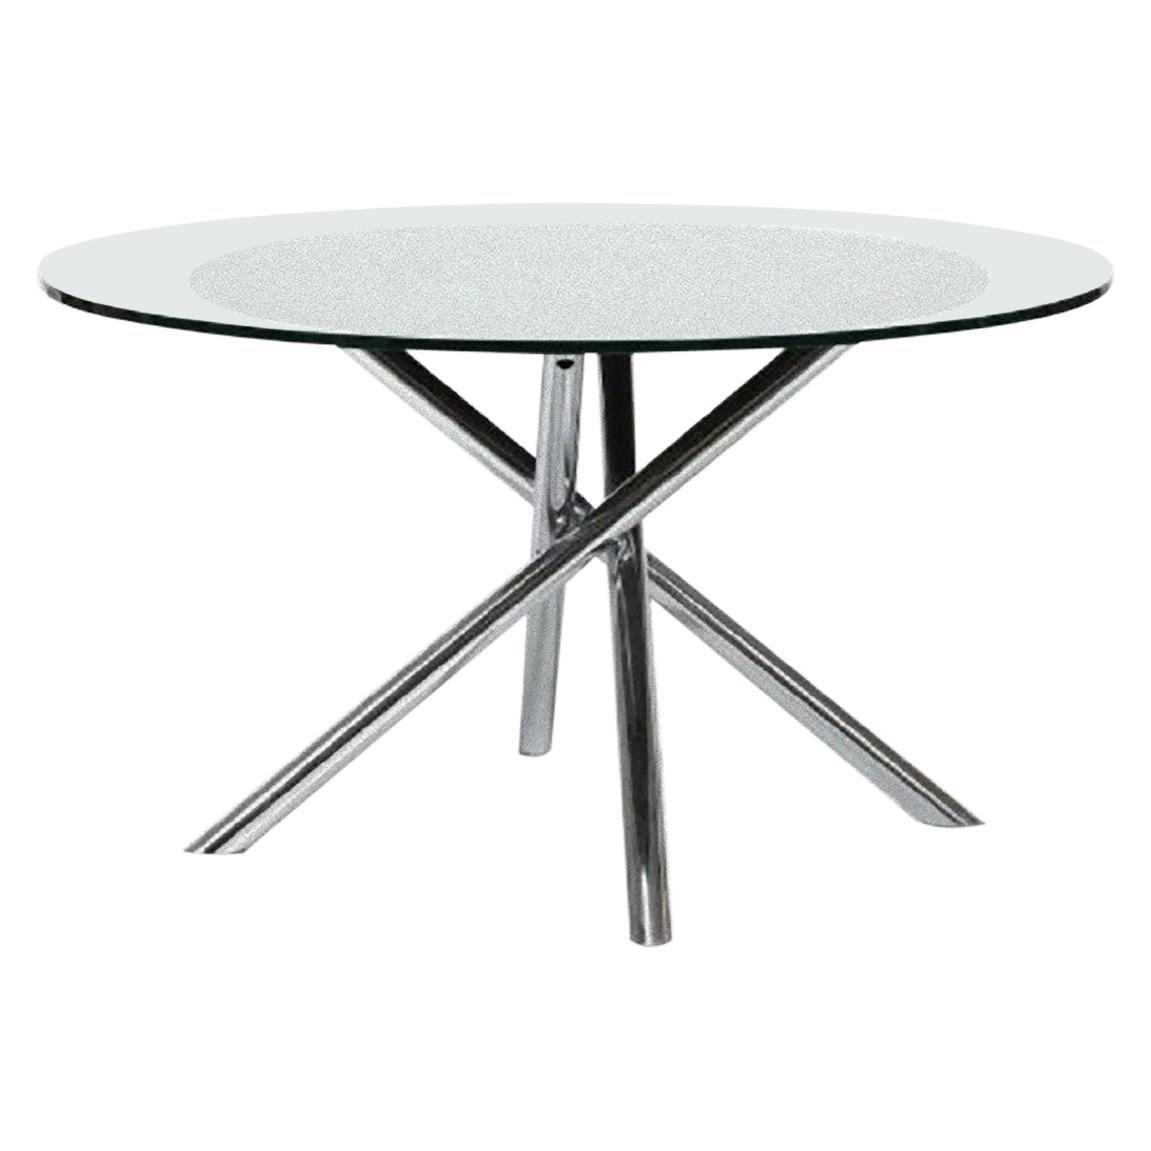 T70 Vintage Table, Carlo Bartoli for Tisettanta, 1970s